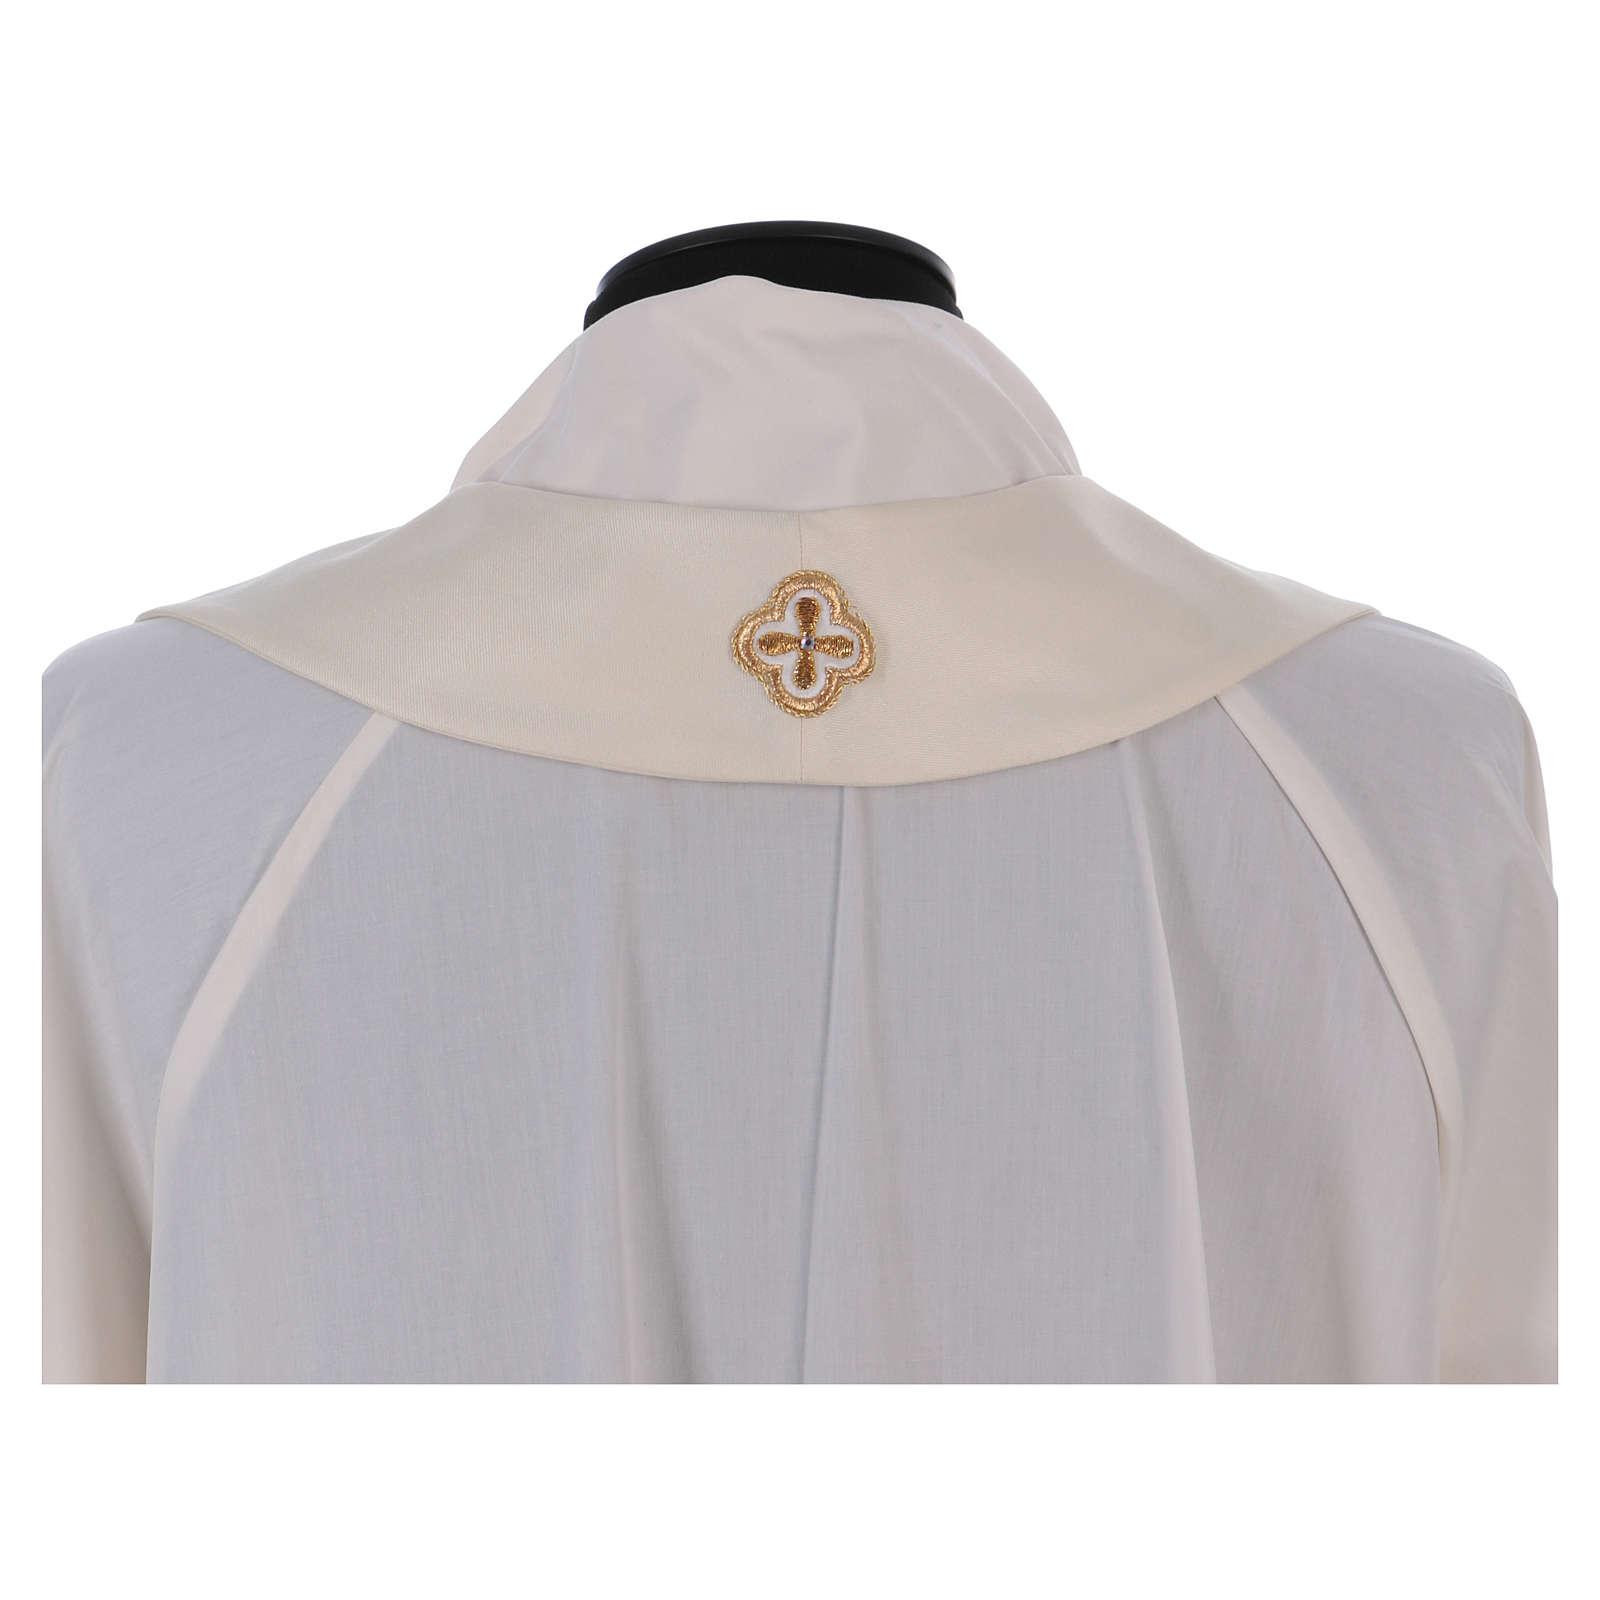 Casula bianca ricamata a mano seta e lana Monastero Montesole 4